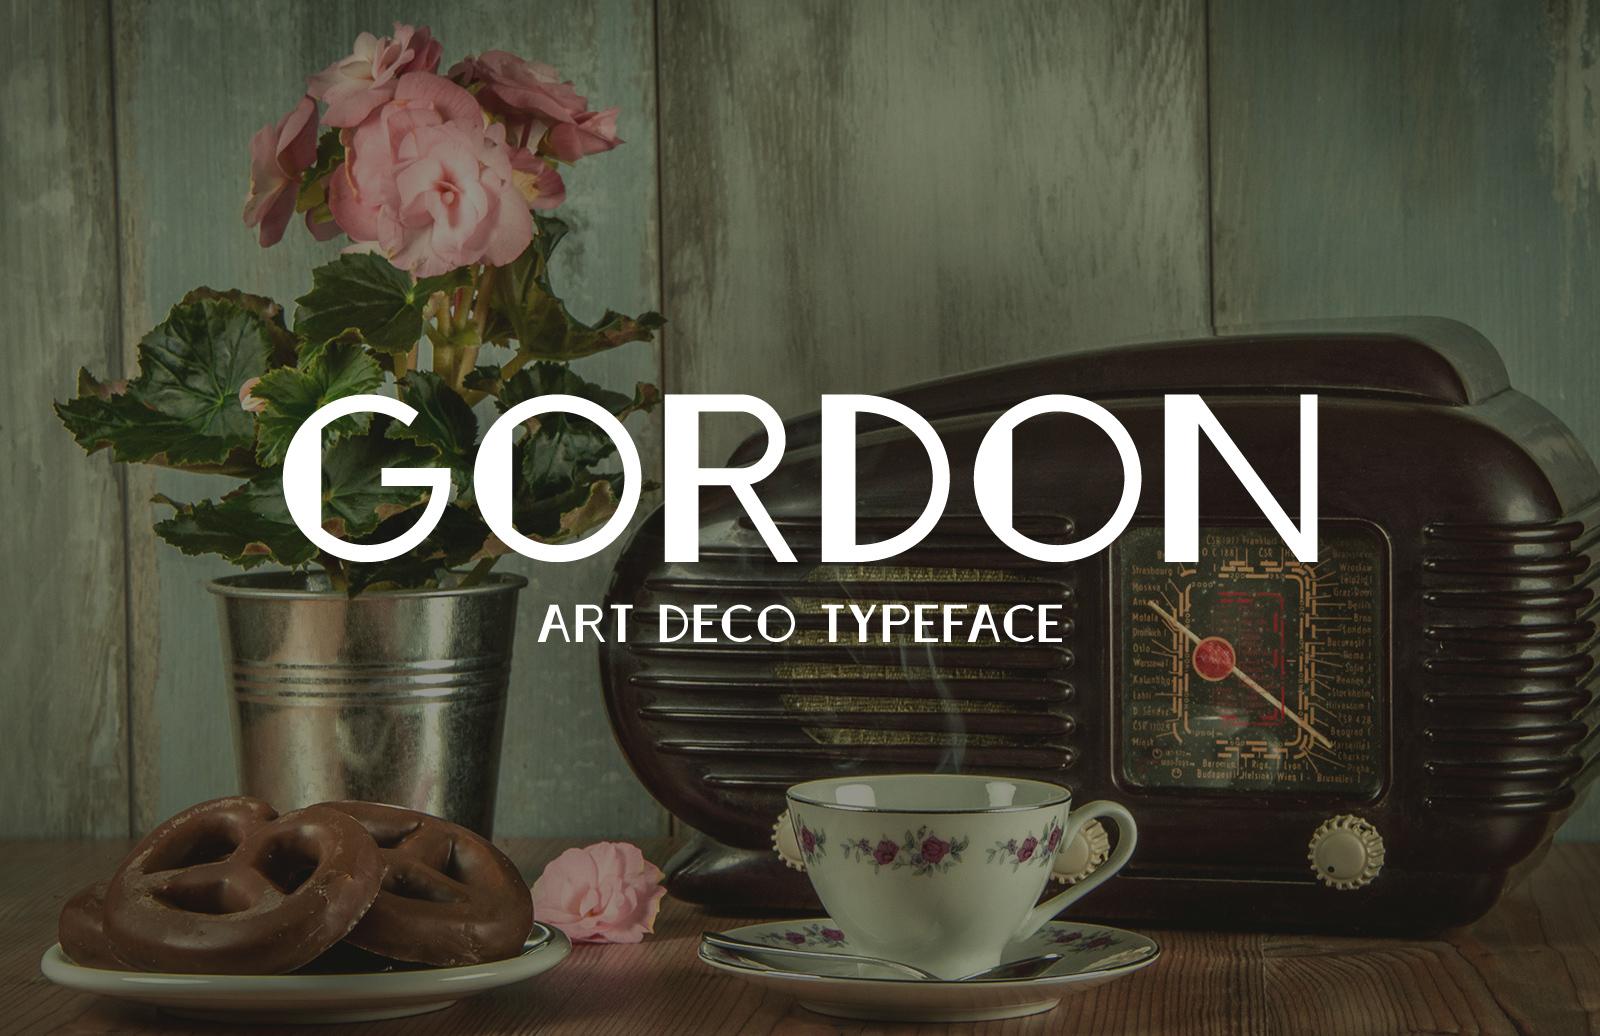 Gordon - Art Deco Typeface